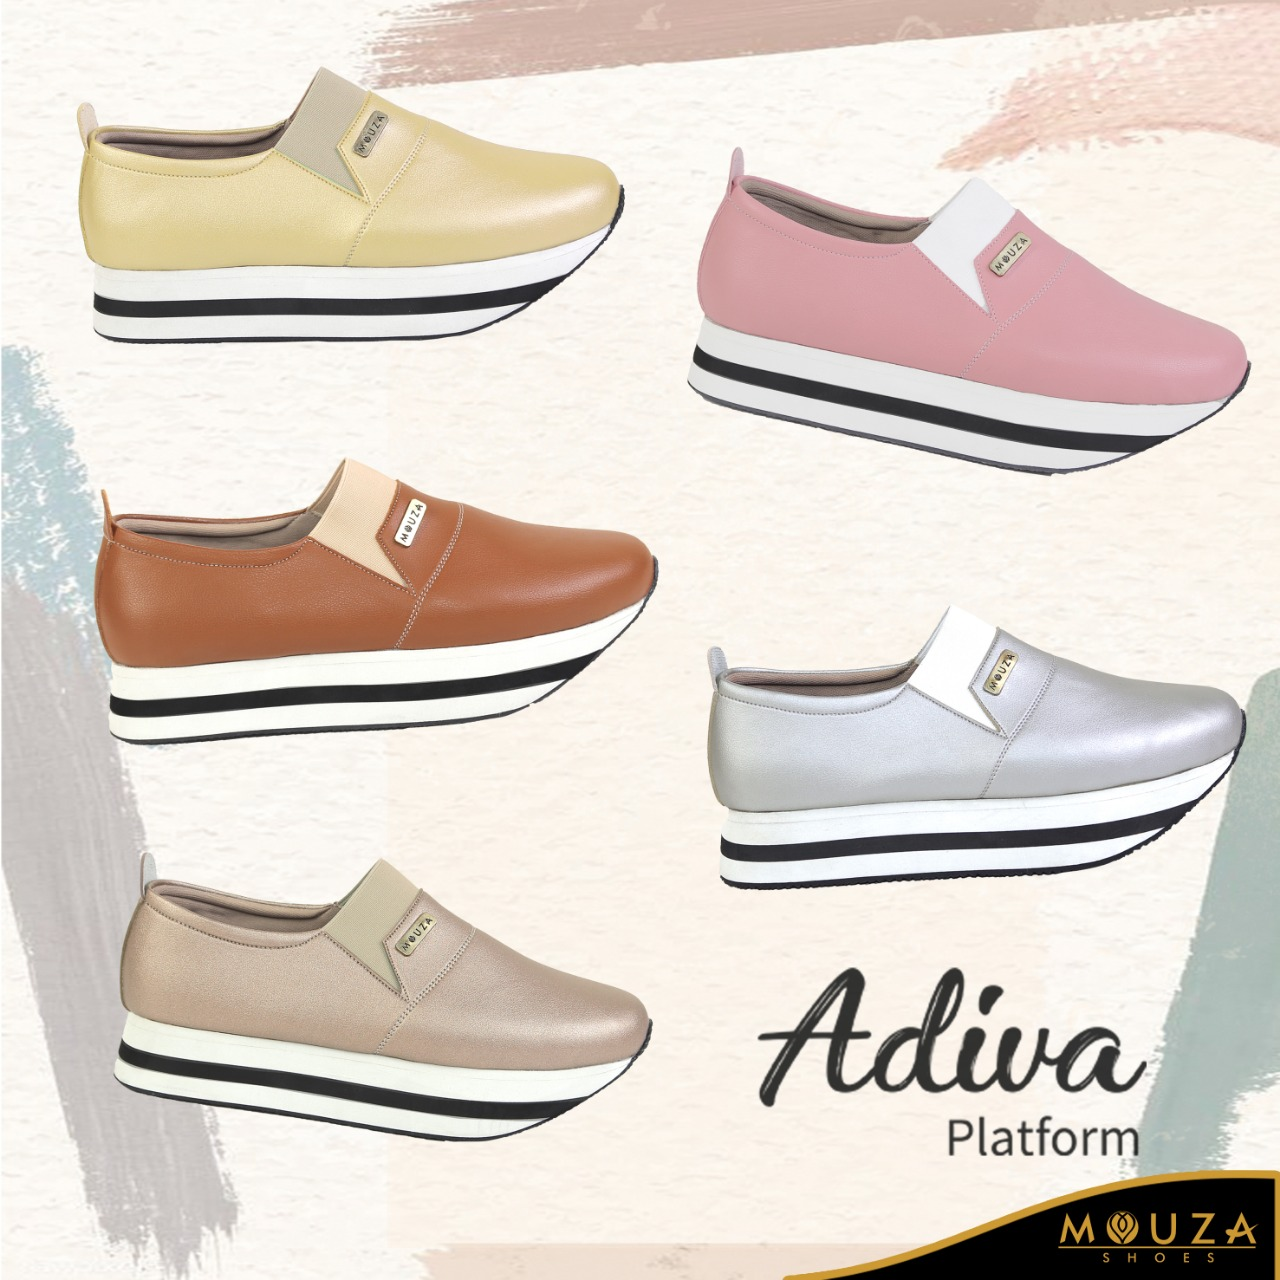 Platform Adiva